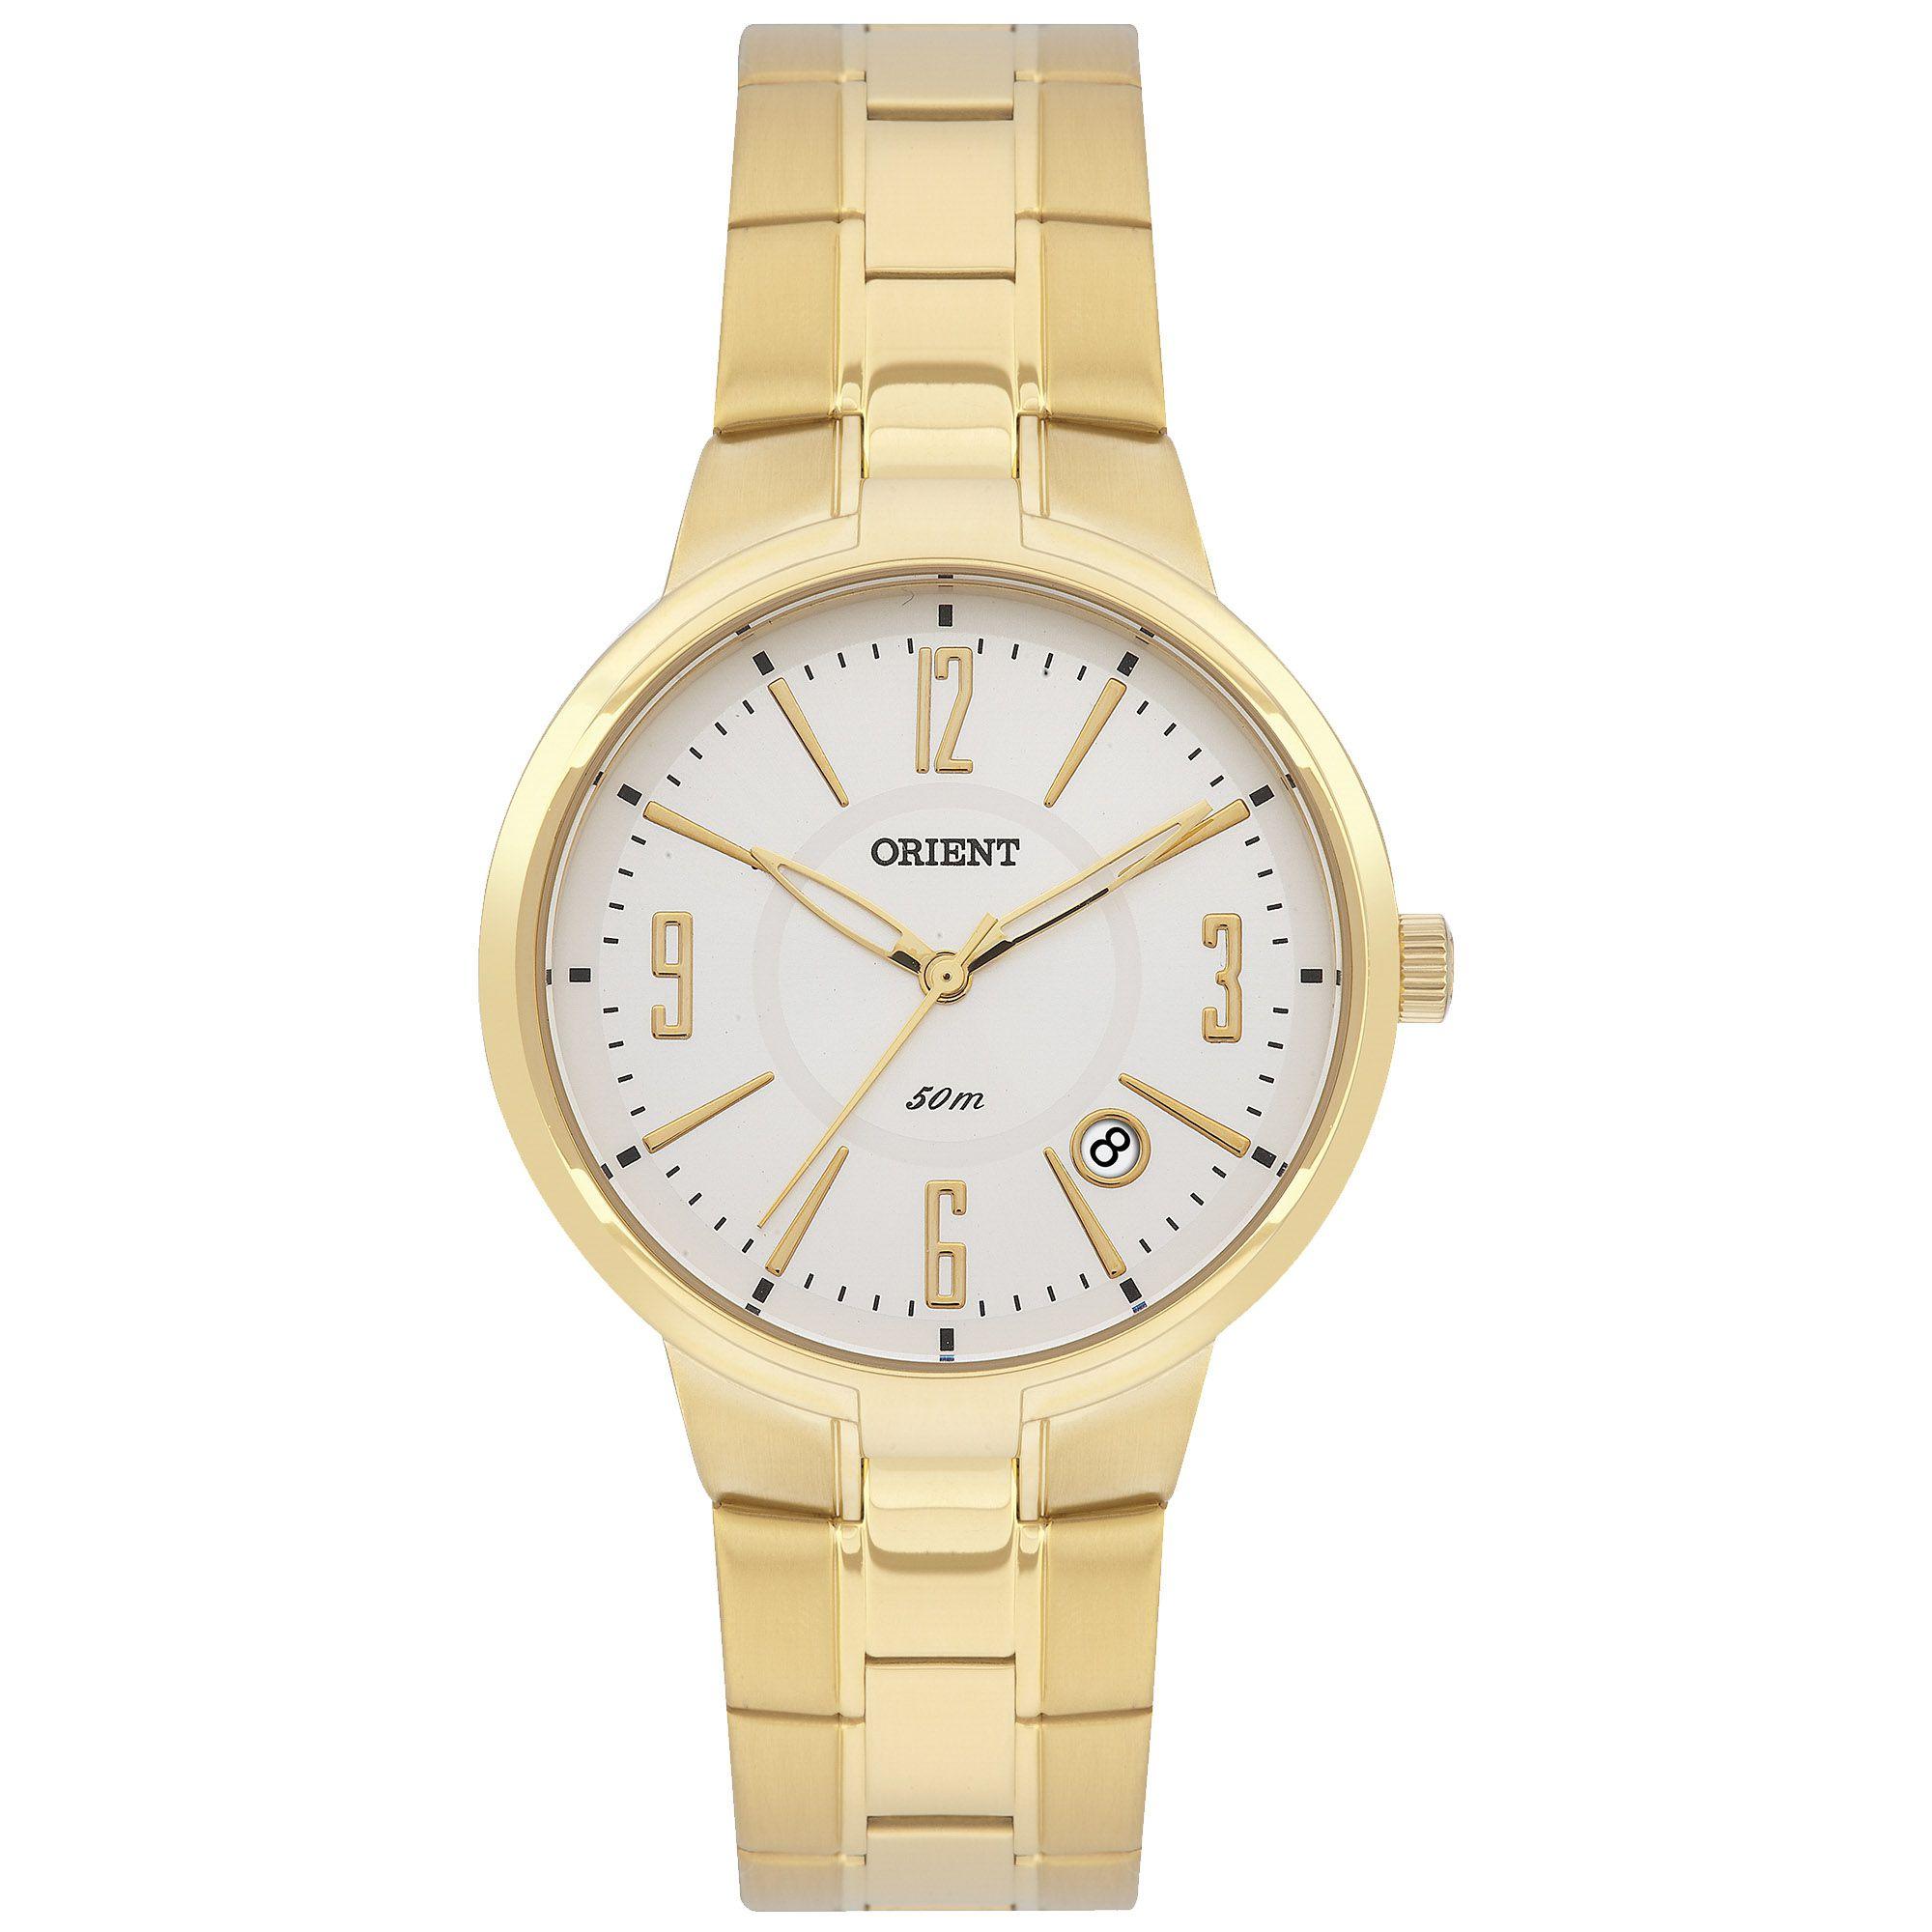 Relógio Feminino Orient FGSS1078 S2KX